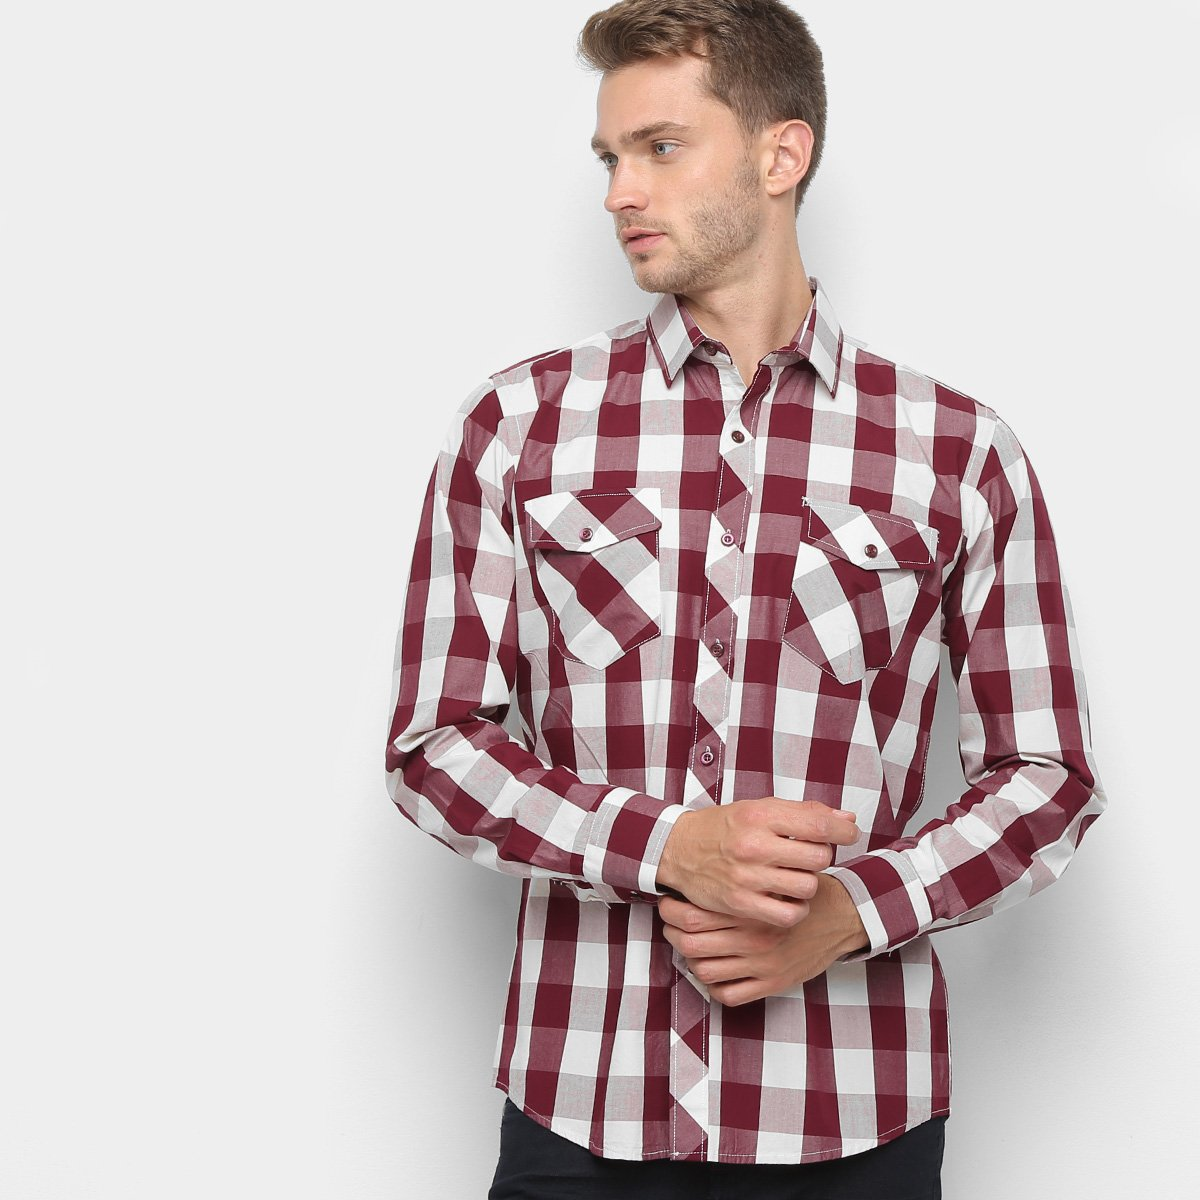 9f909b0fbbf4 Camisa Xadrez Watkins & Krown Masculina - Tam: 5 - Shopping TudoAzul